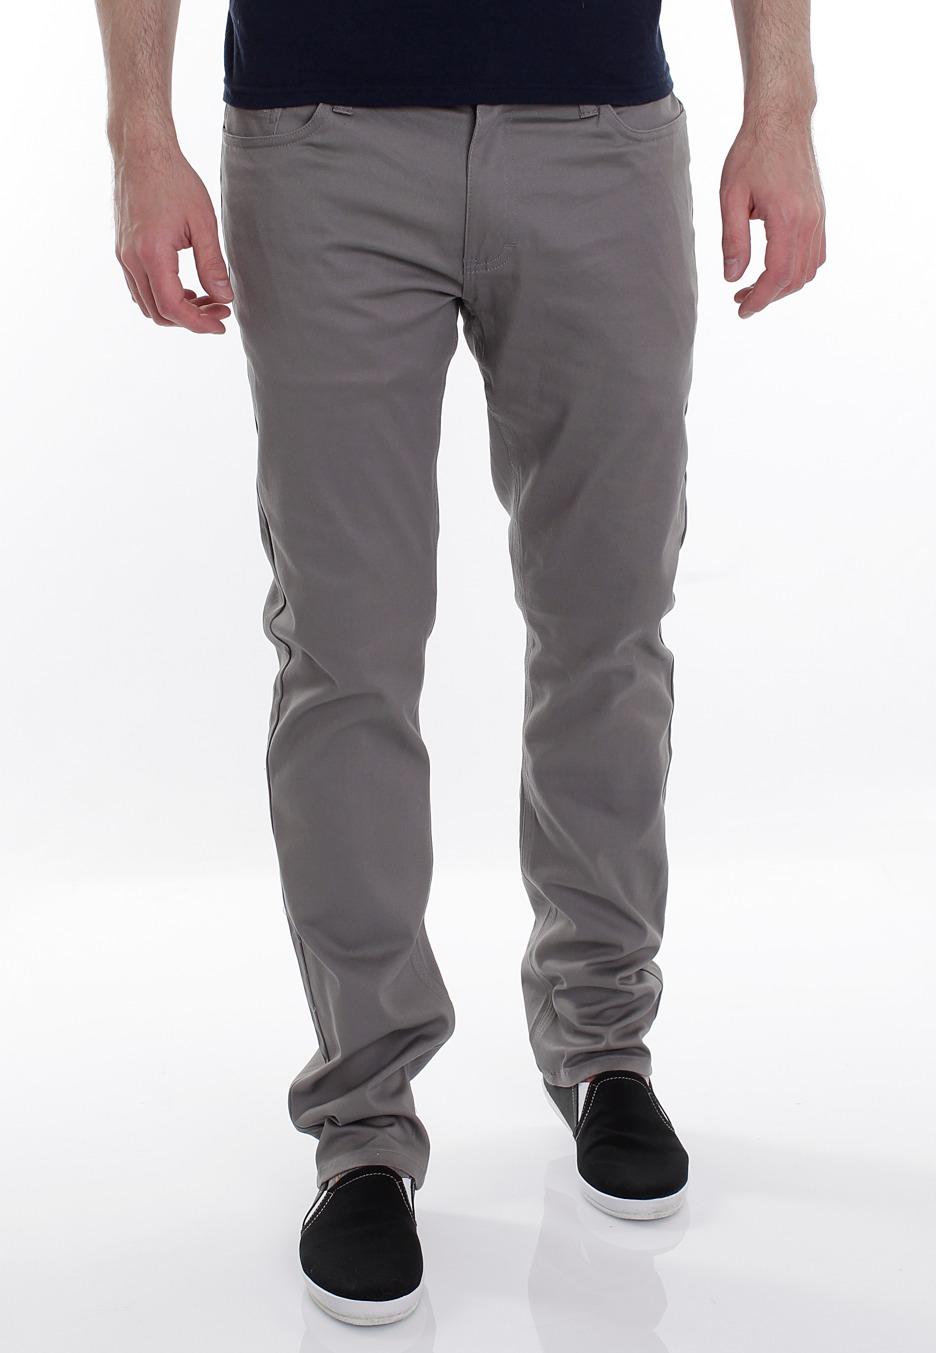 grey twill pants - Pi Pants